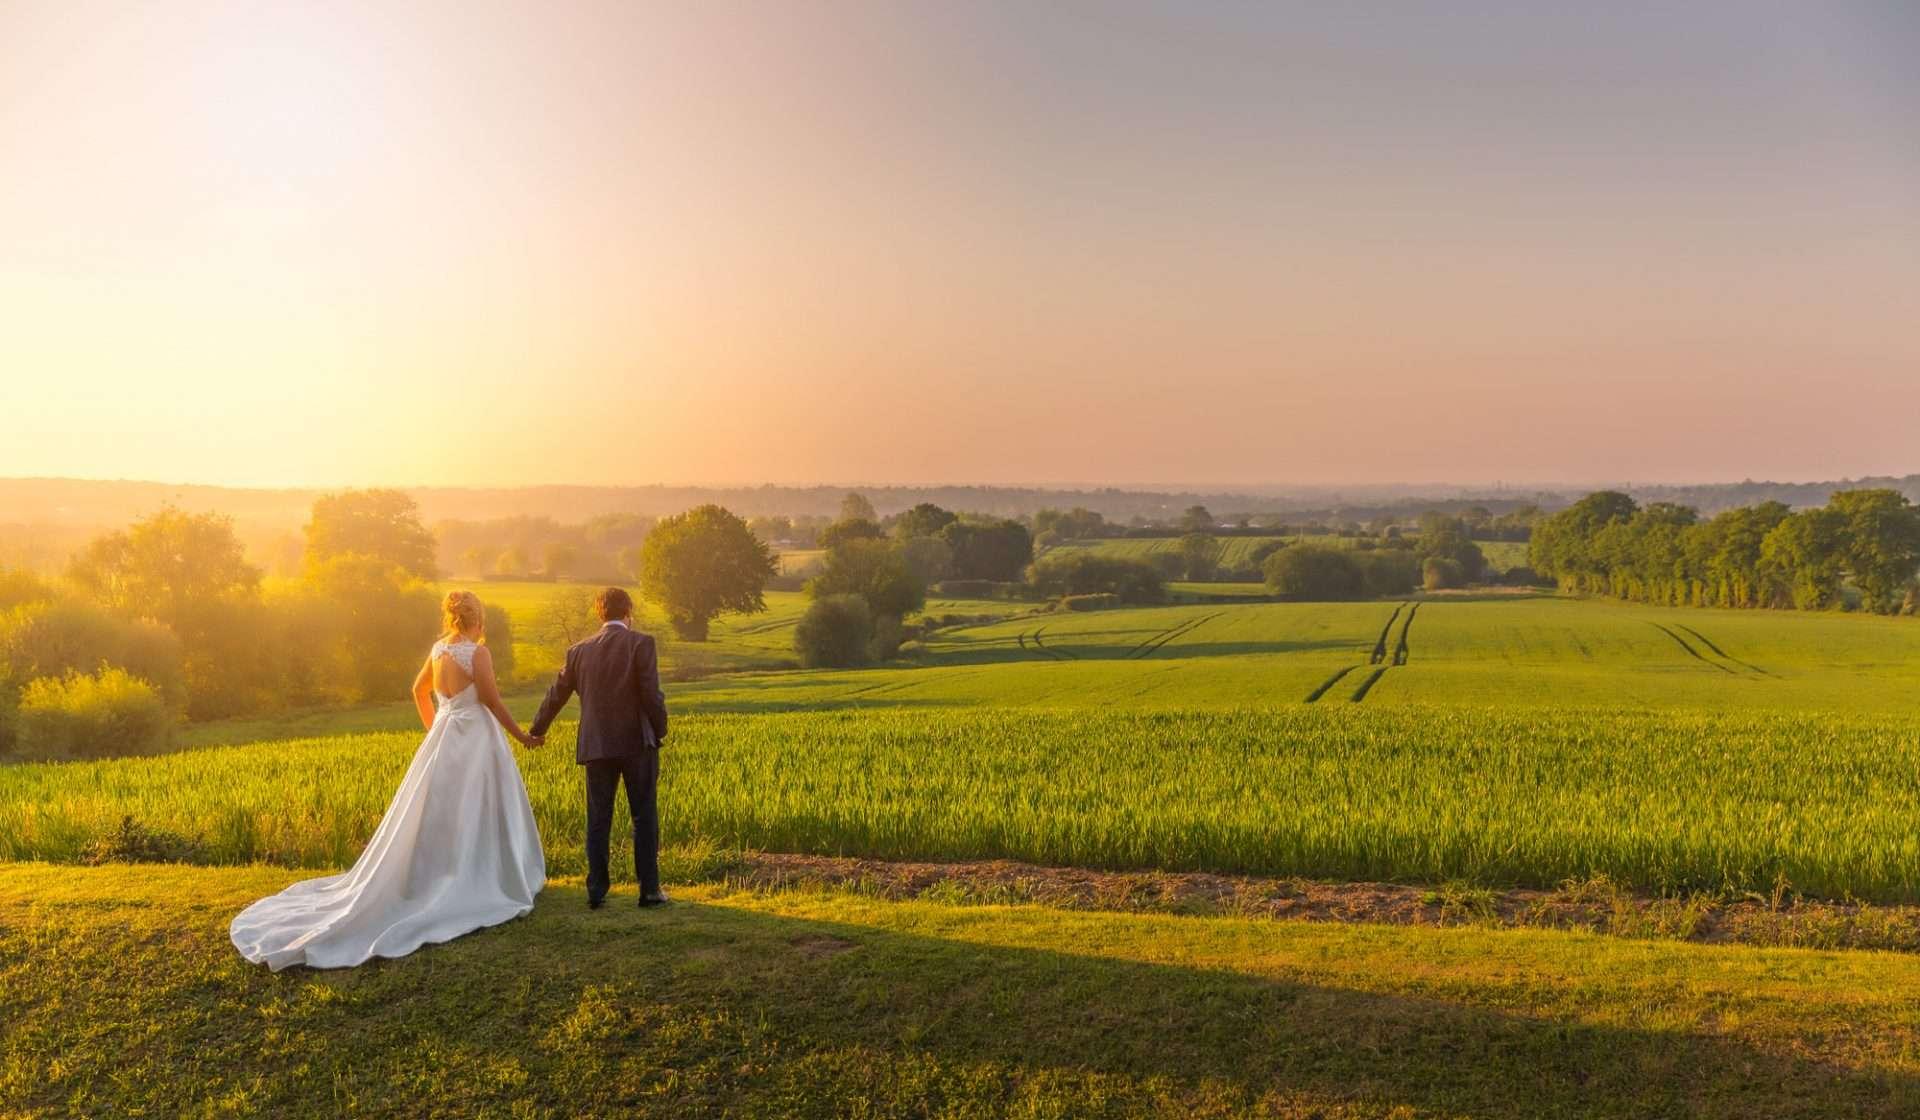 Crondon-Park-Wedding-photography-Chris-Woodman-photography-02